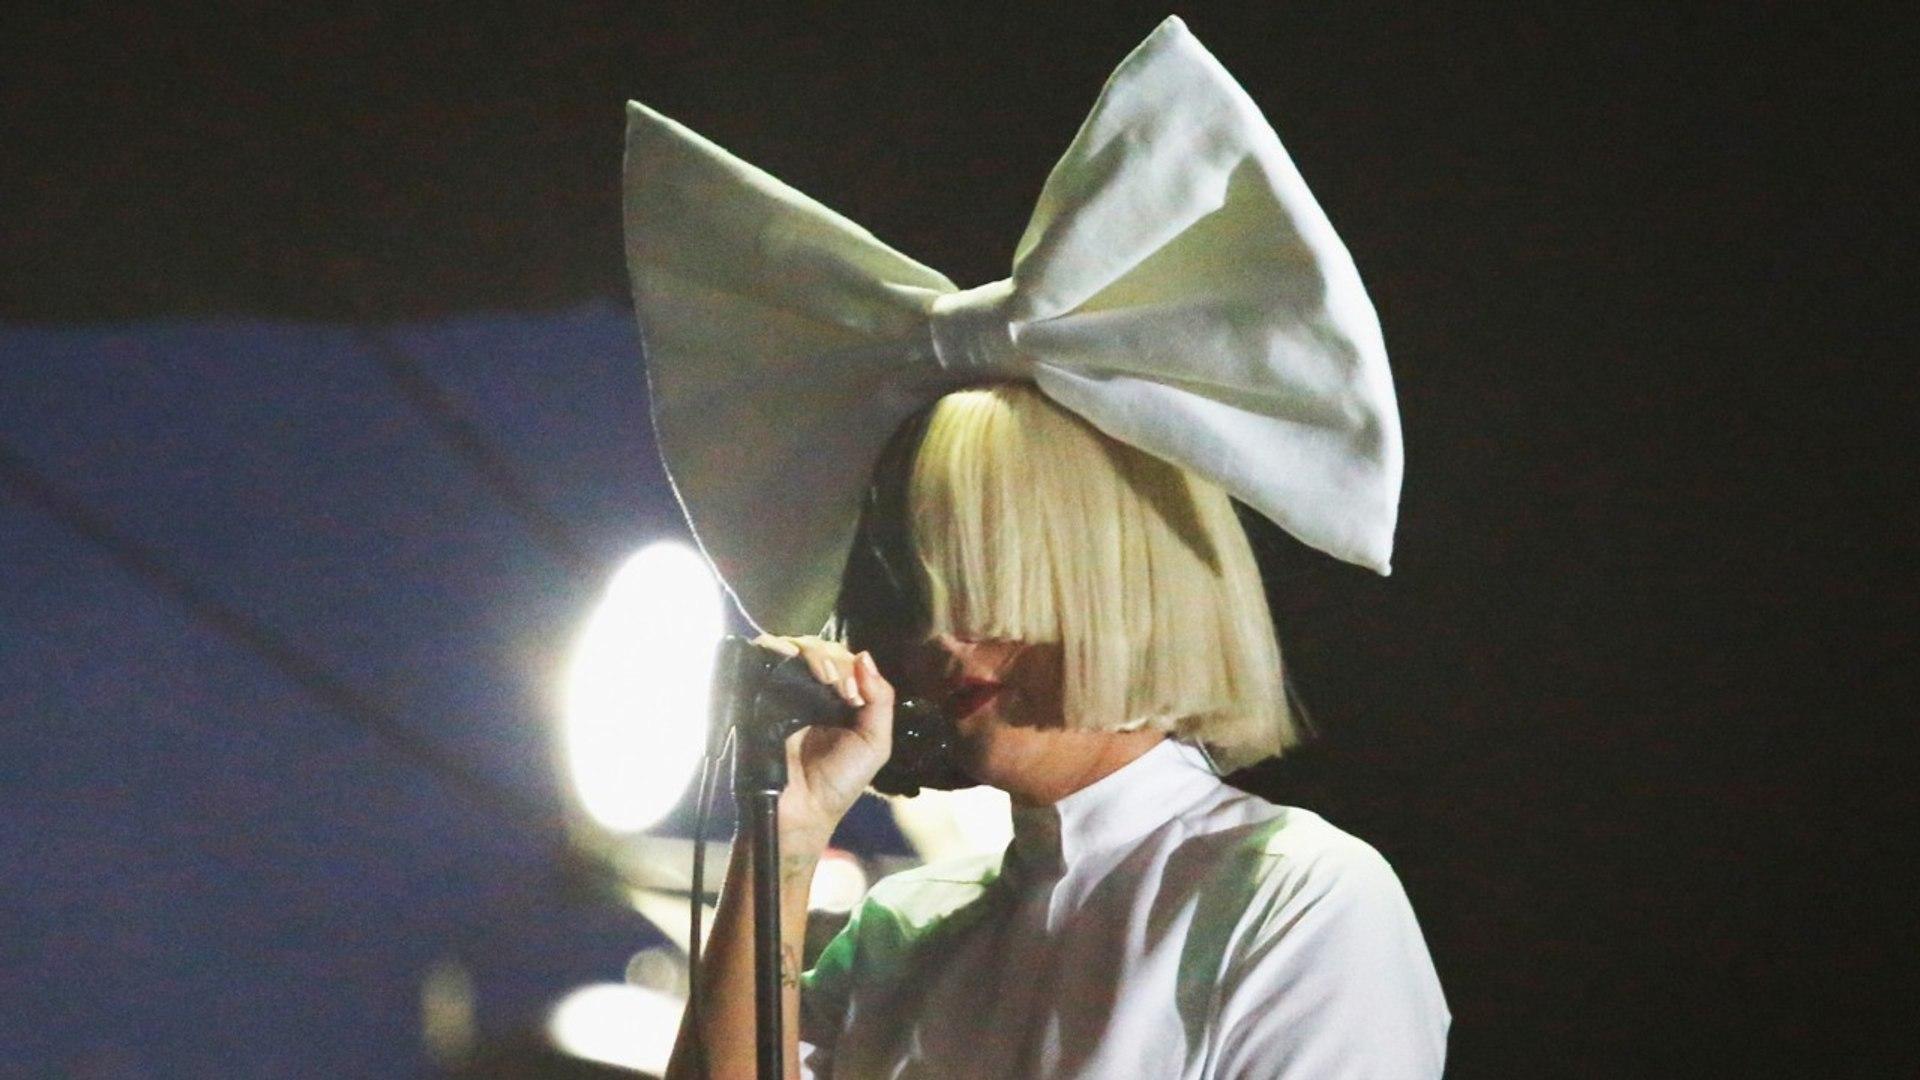 Zoe Saldana-Featuring Sia Music Video Spotlights HIV Awareness